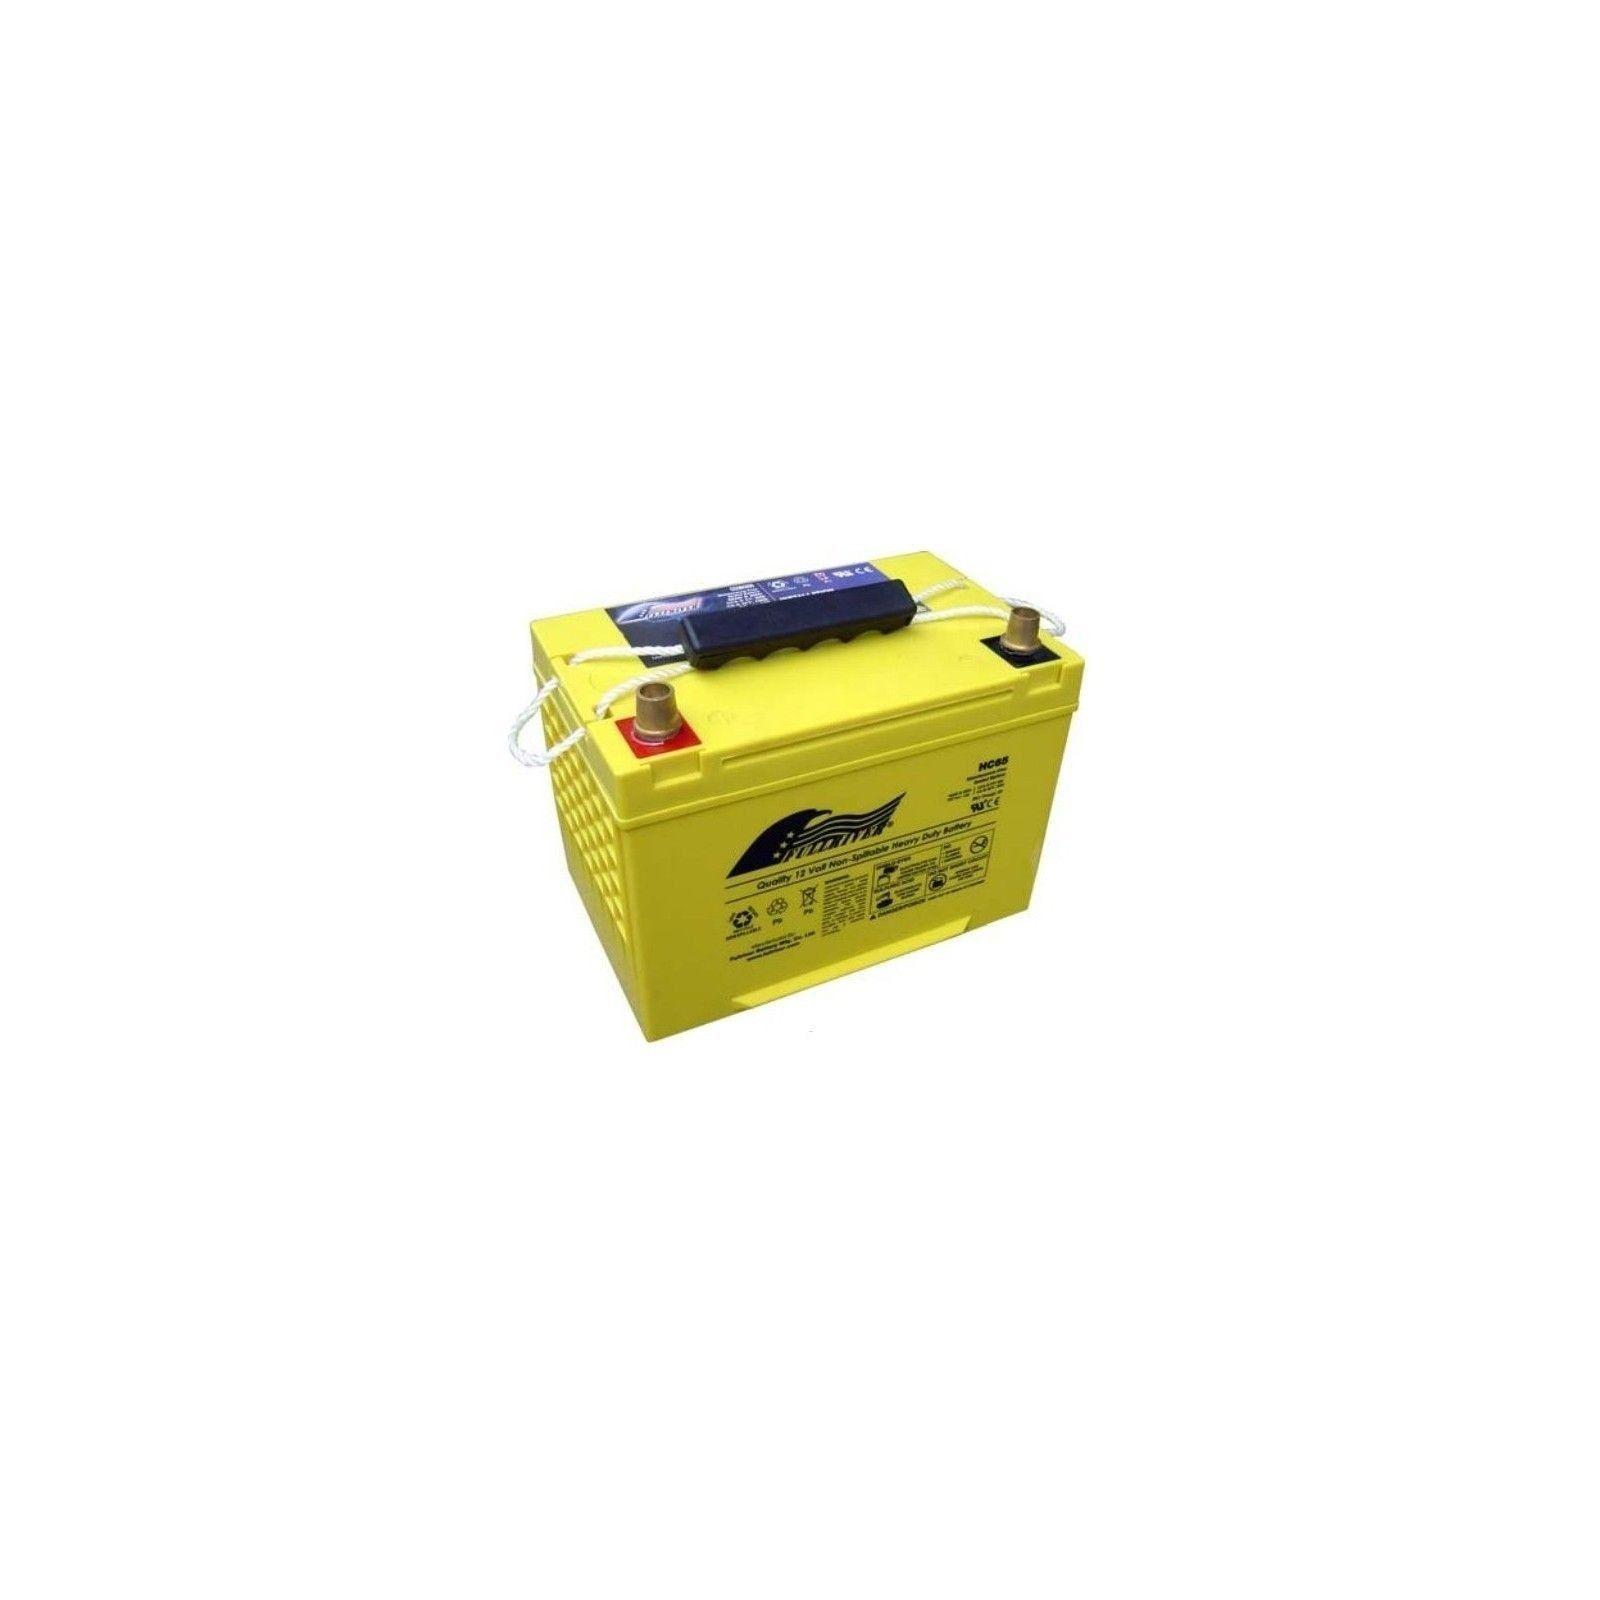 BATERIA Fullriver FULLRIVER HC65/T 65Ah 825A 12V FULLRIVER - 1